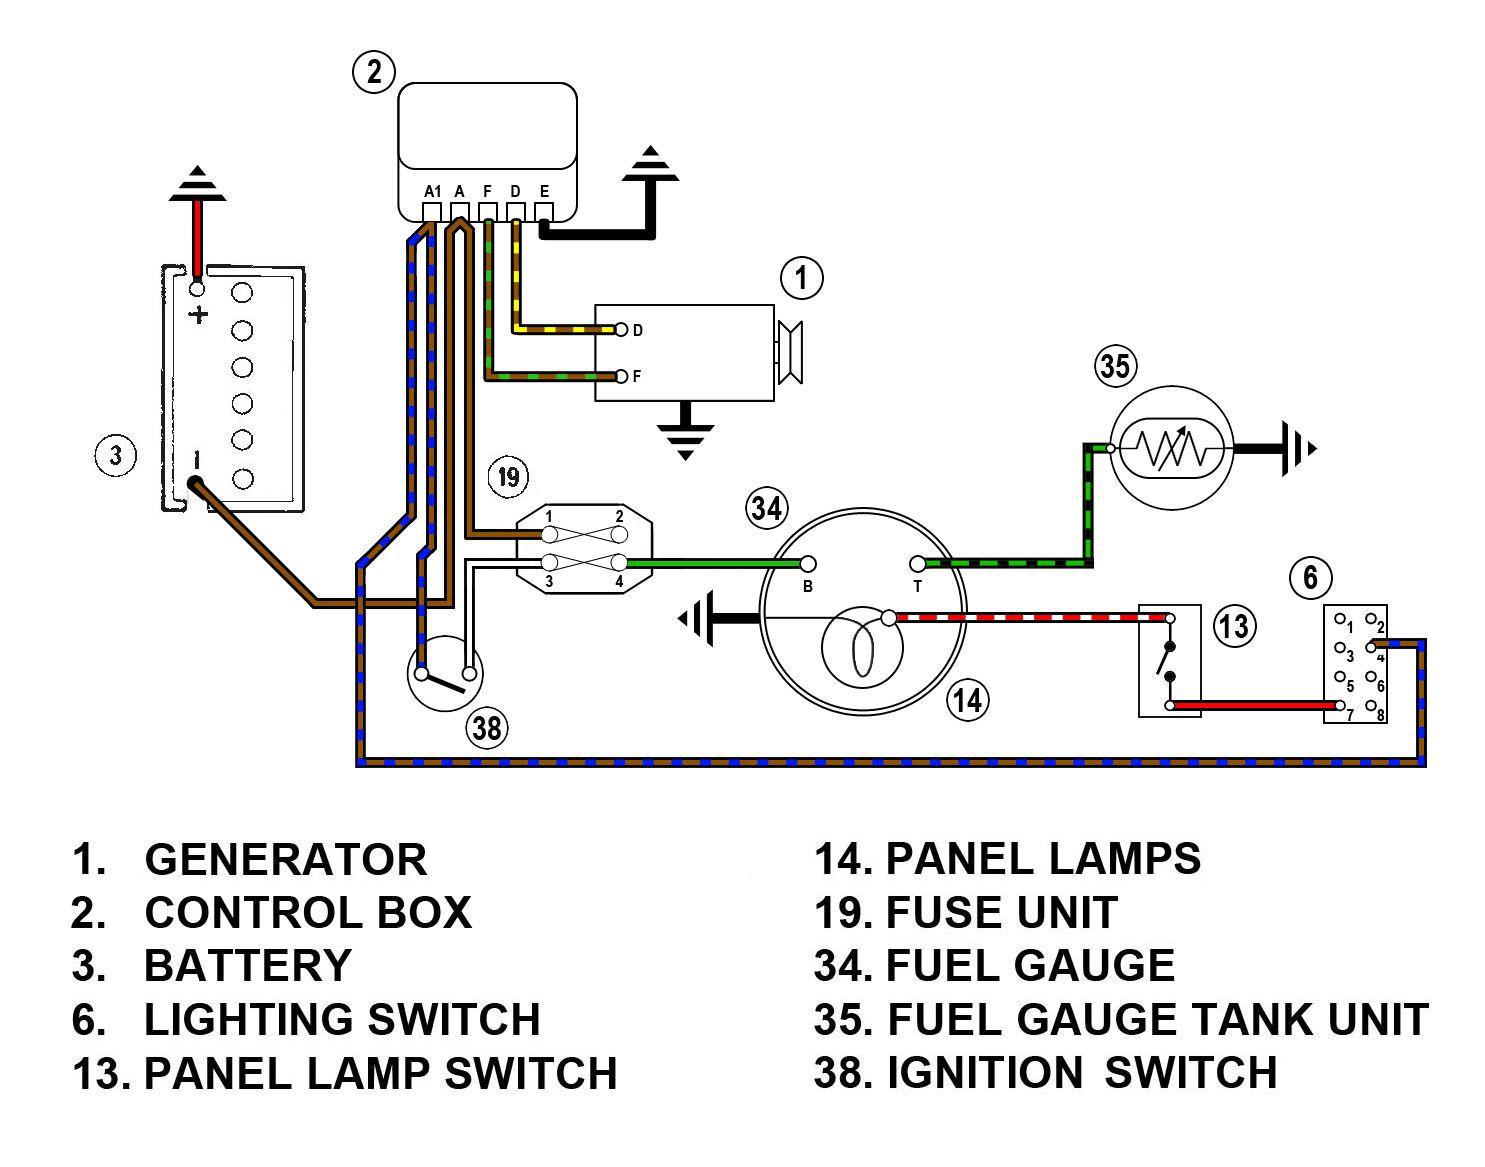 ford fuel sending unit wiring fuel sender wiring diagram library wiring diagram fuel sender  fuel sender wiring diagram library